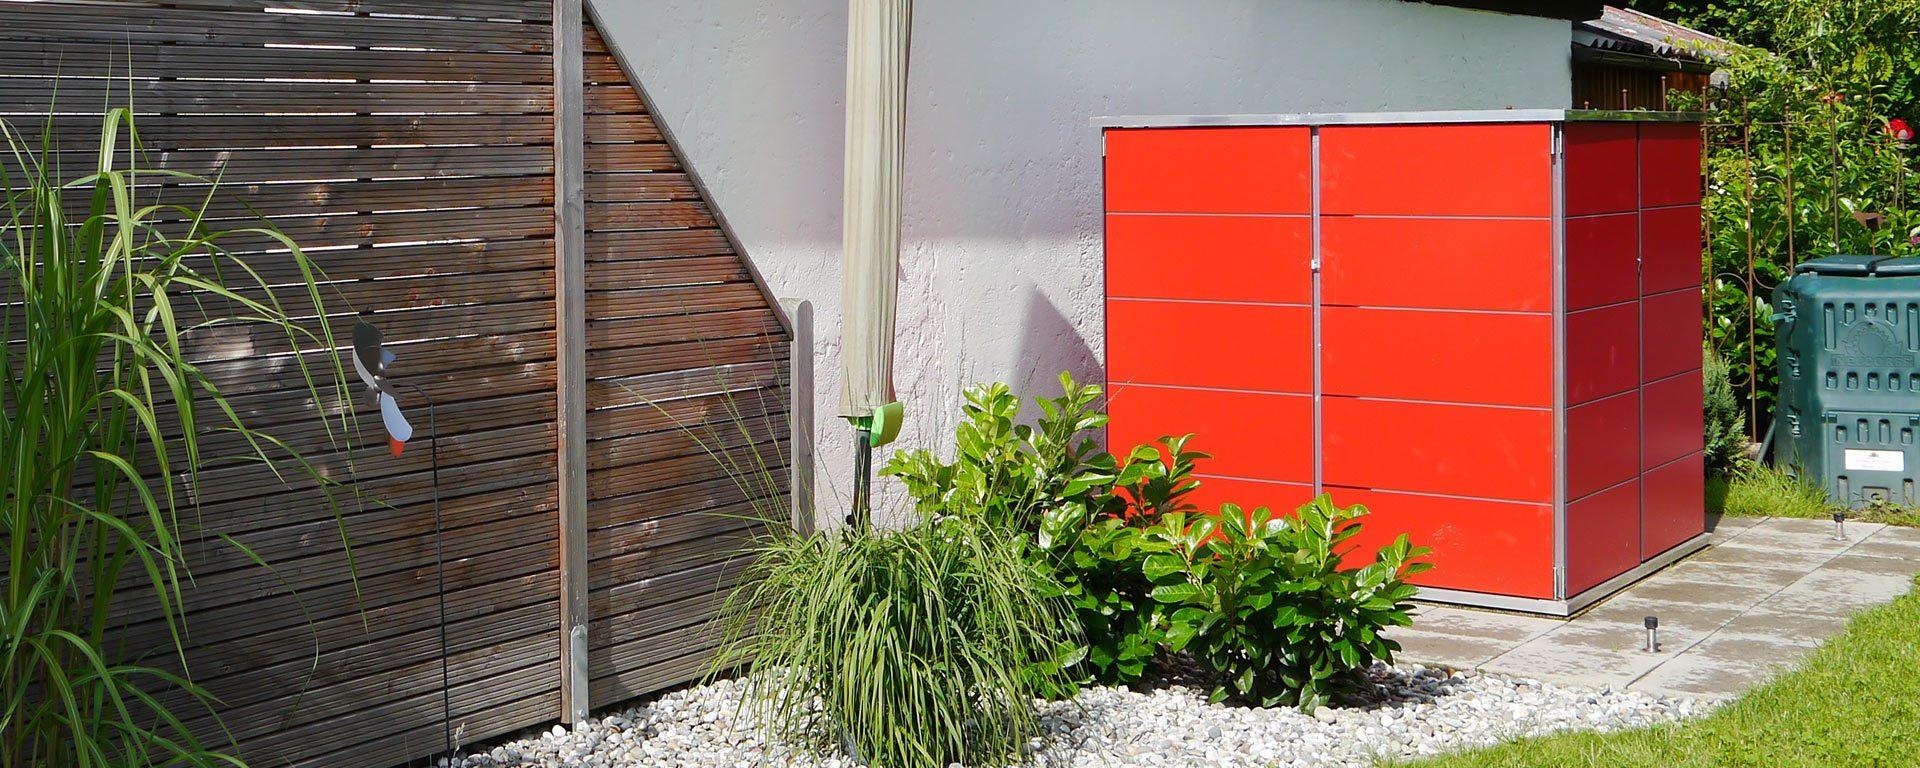 Gartenhaus Baugenehmigung Garten Q Gmbh